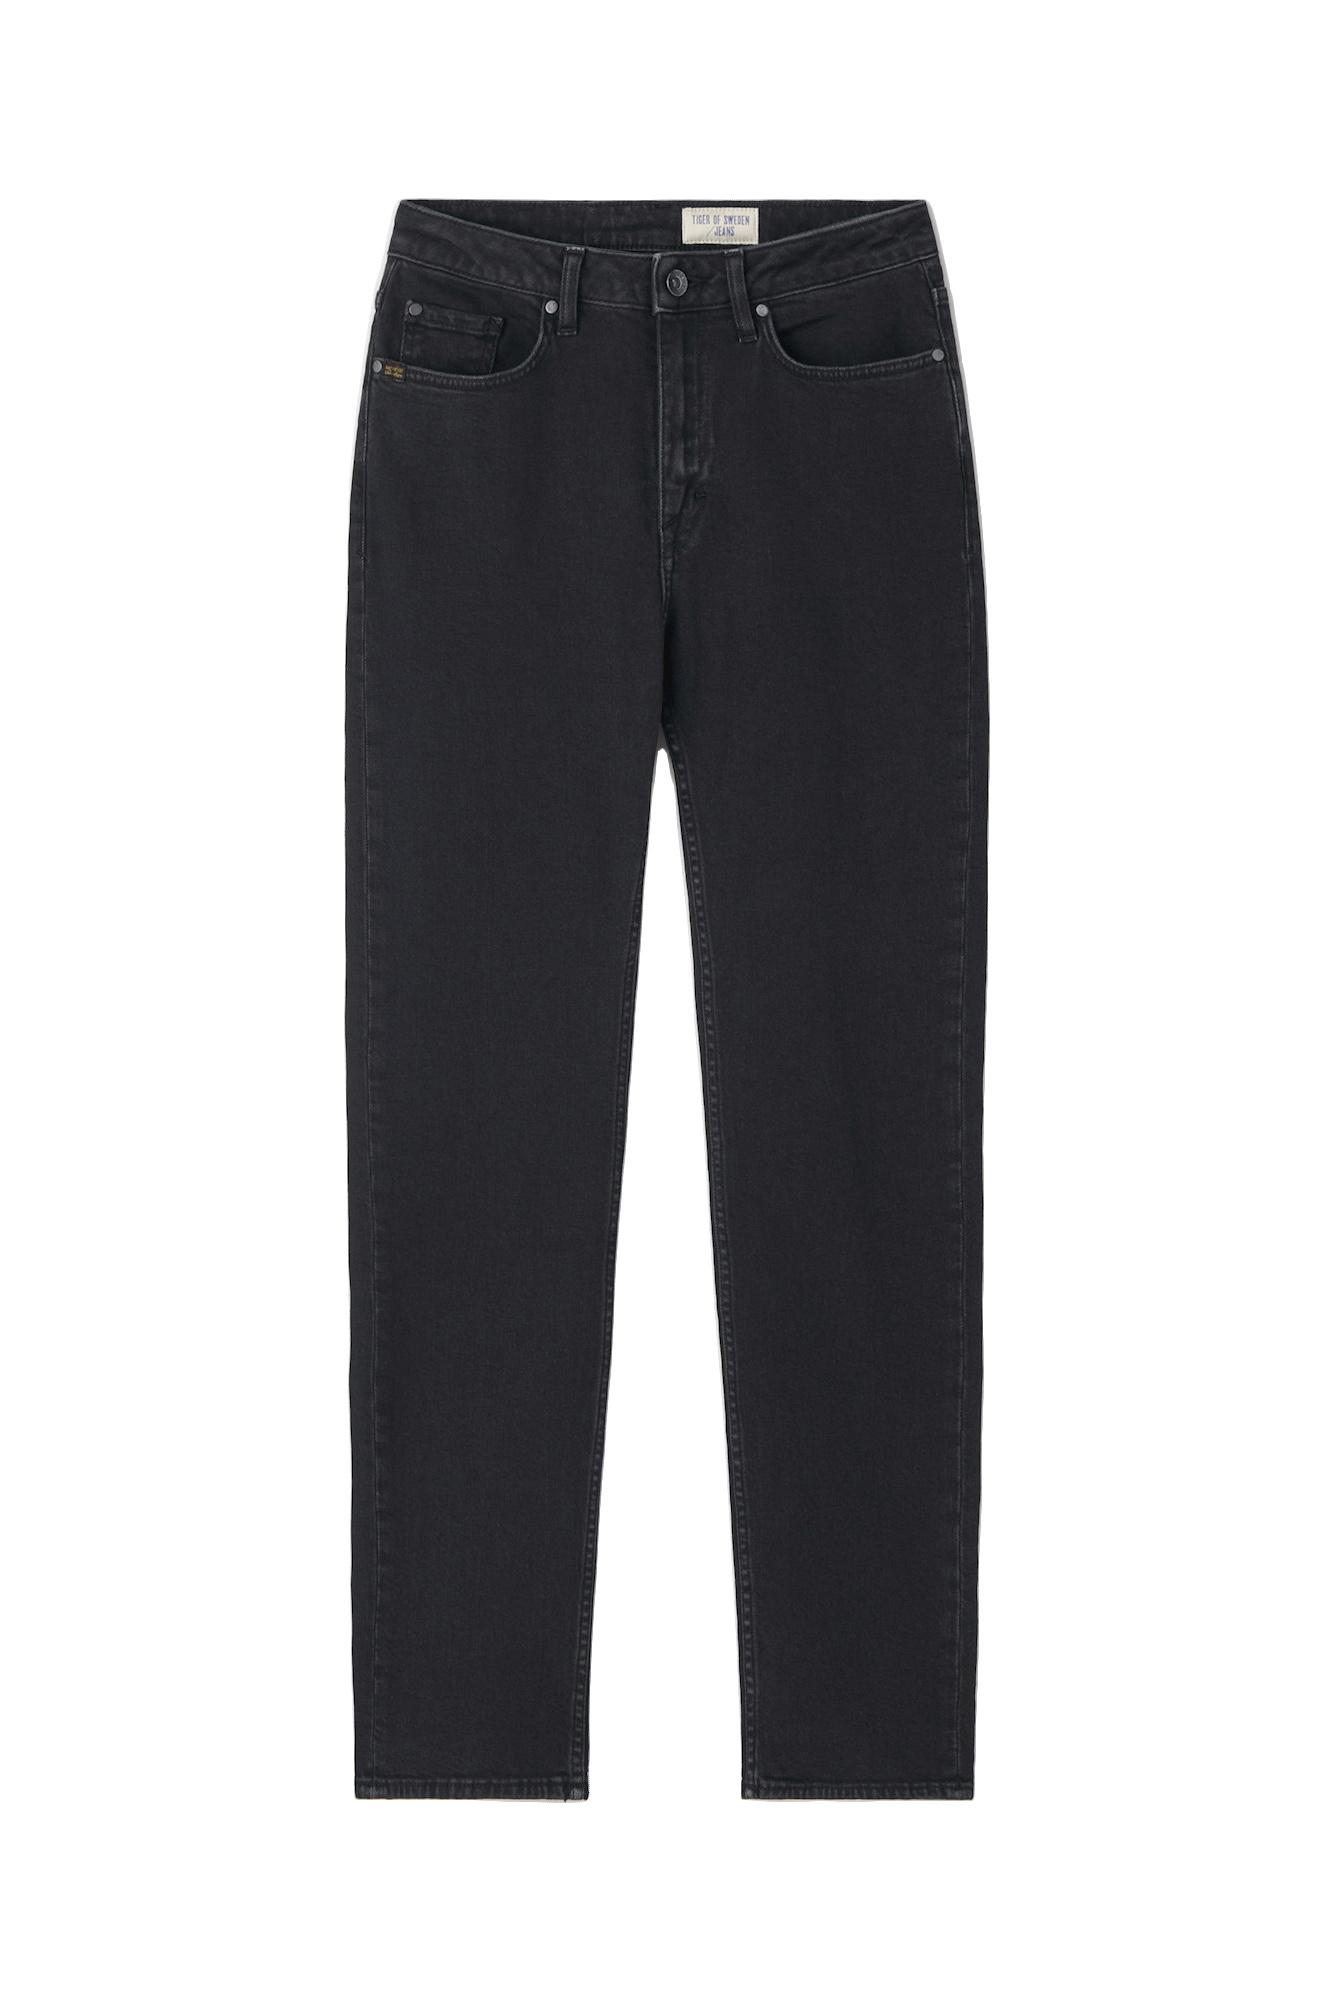 Meg Jeans - Black-1